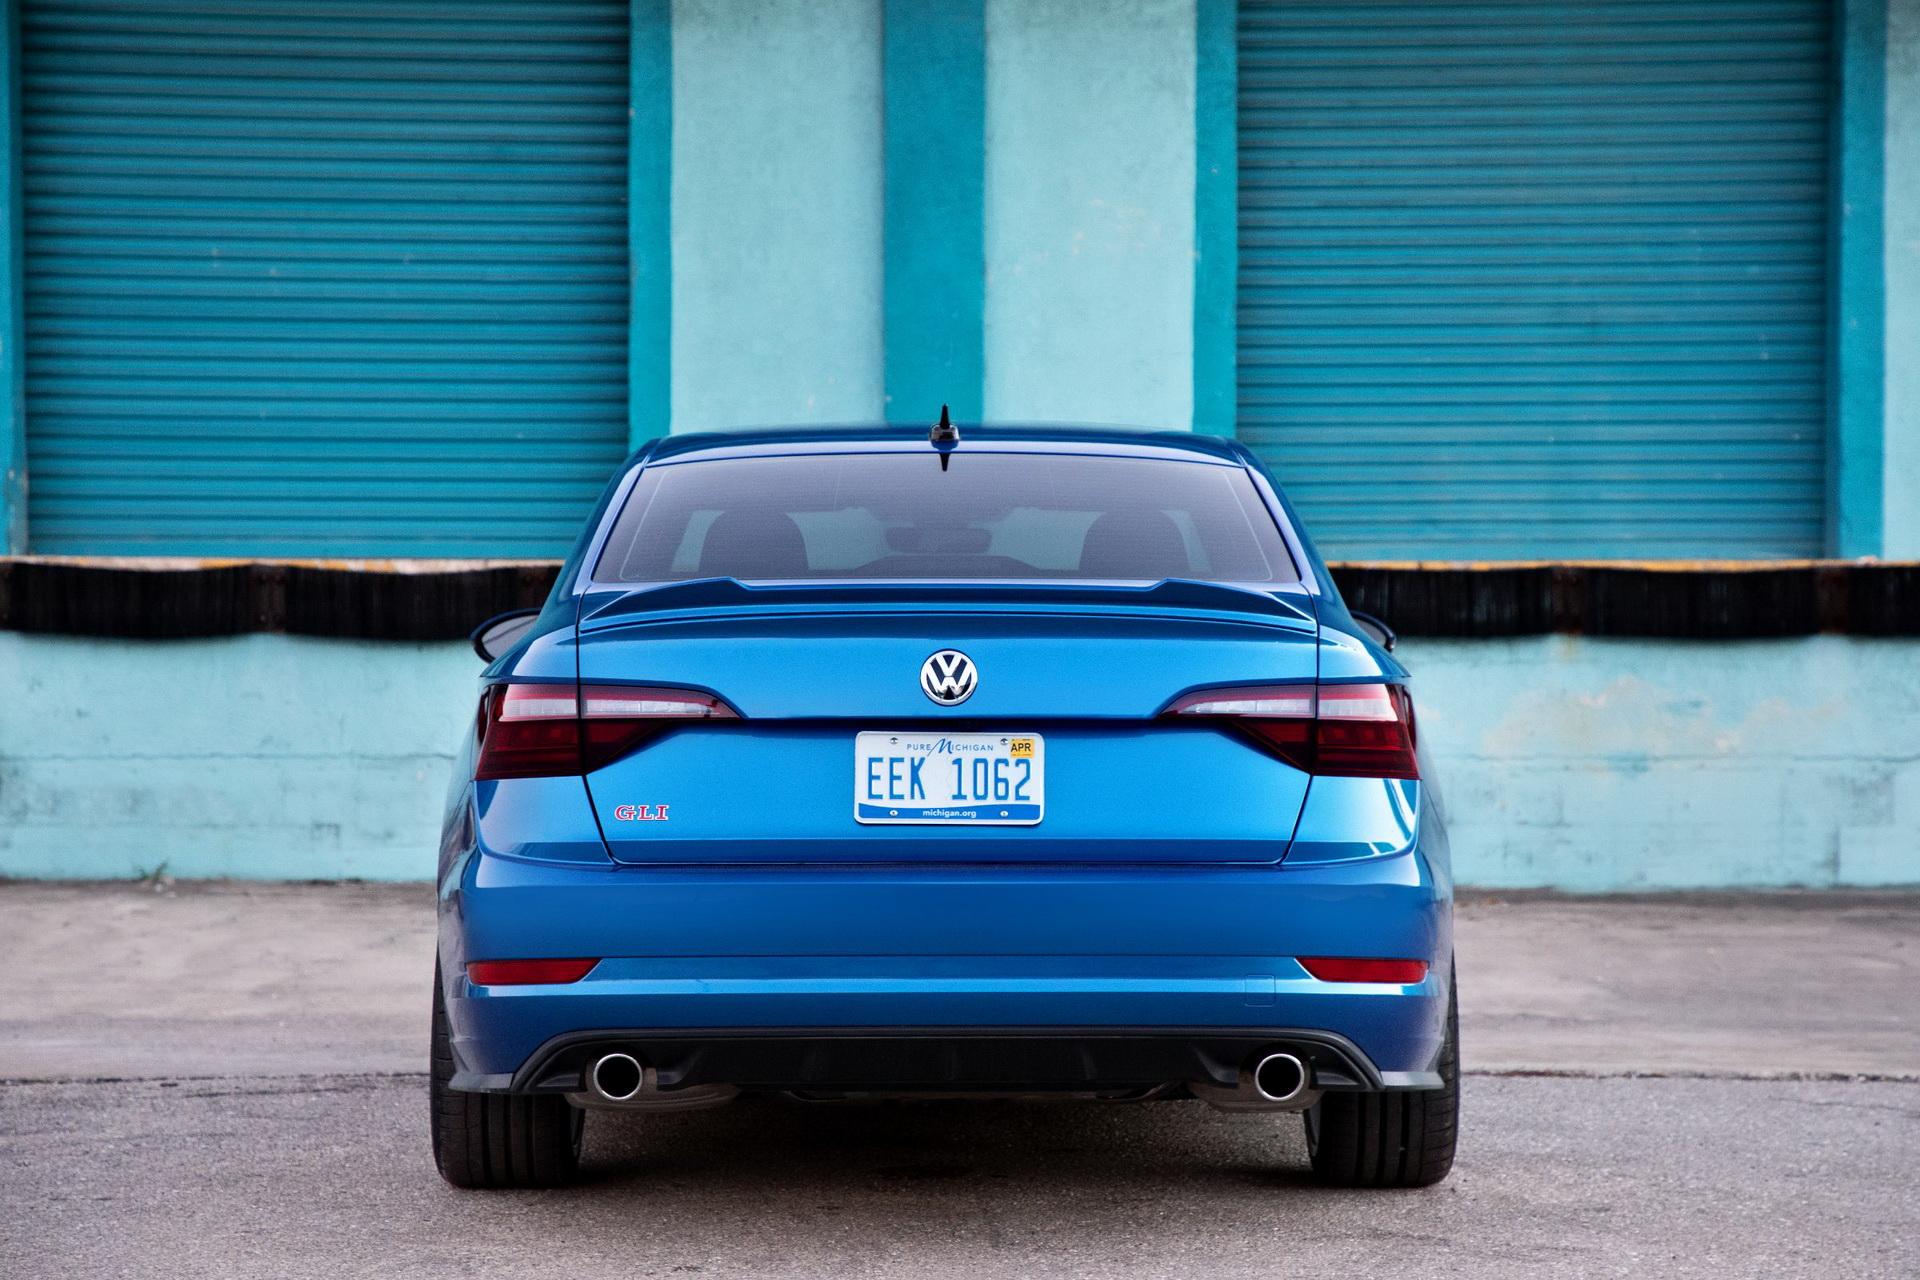 Volkswagen готовит спецсерию популярных моделей – Jetta уже готова 3